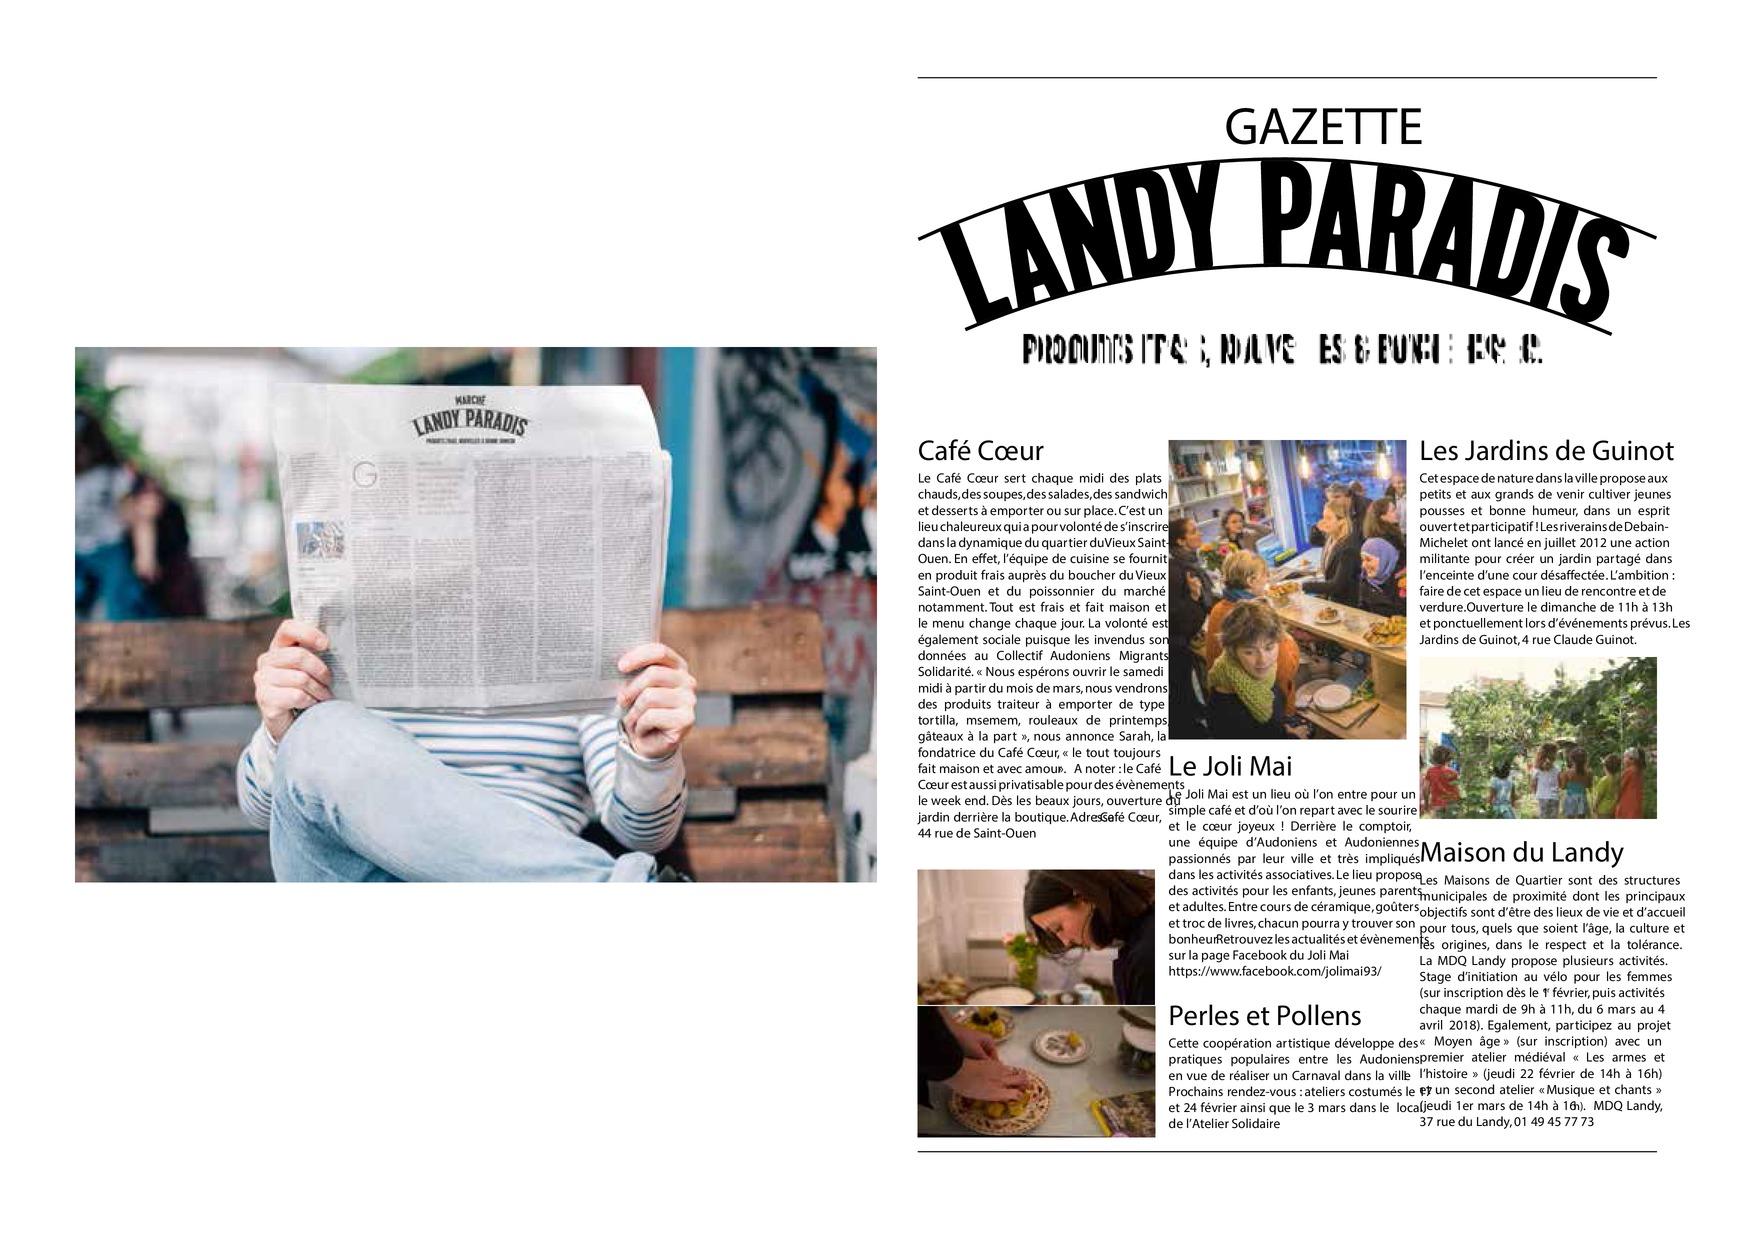 landyparadis-0503_16_0-page0.jpg